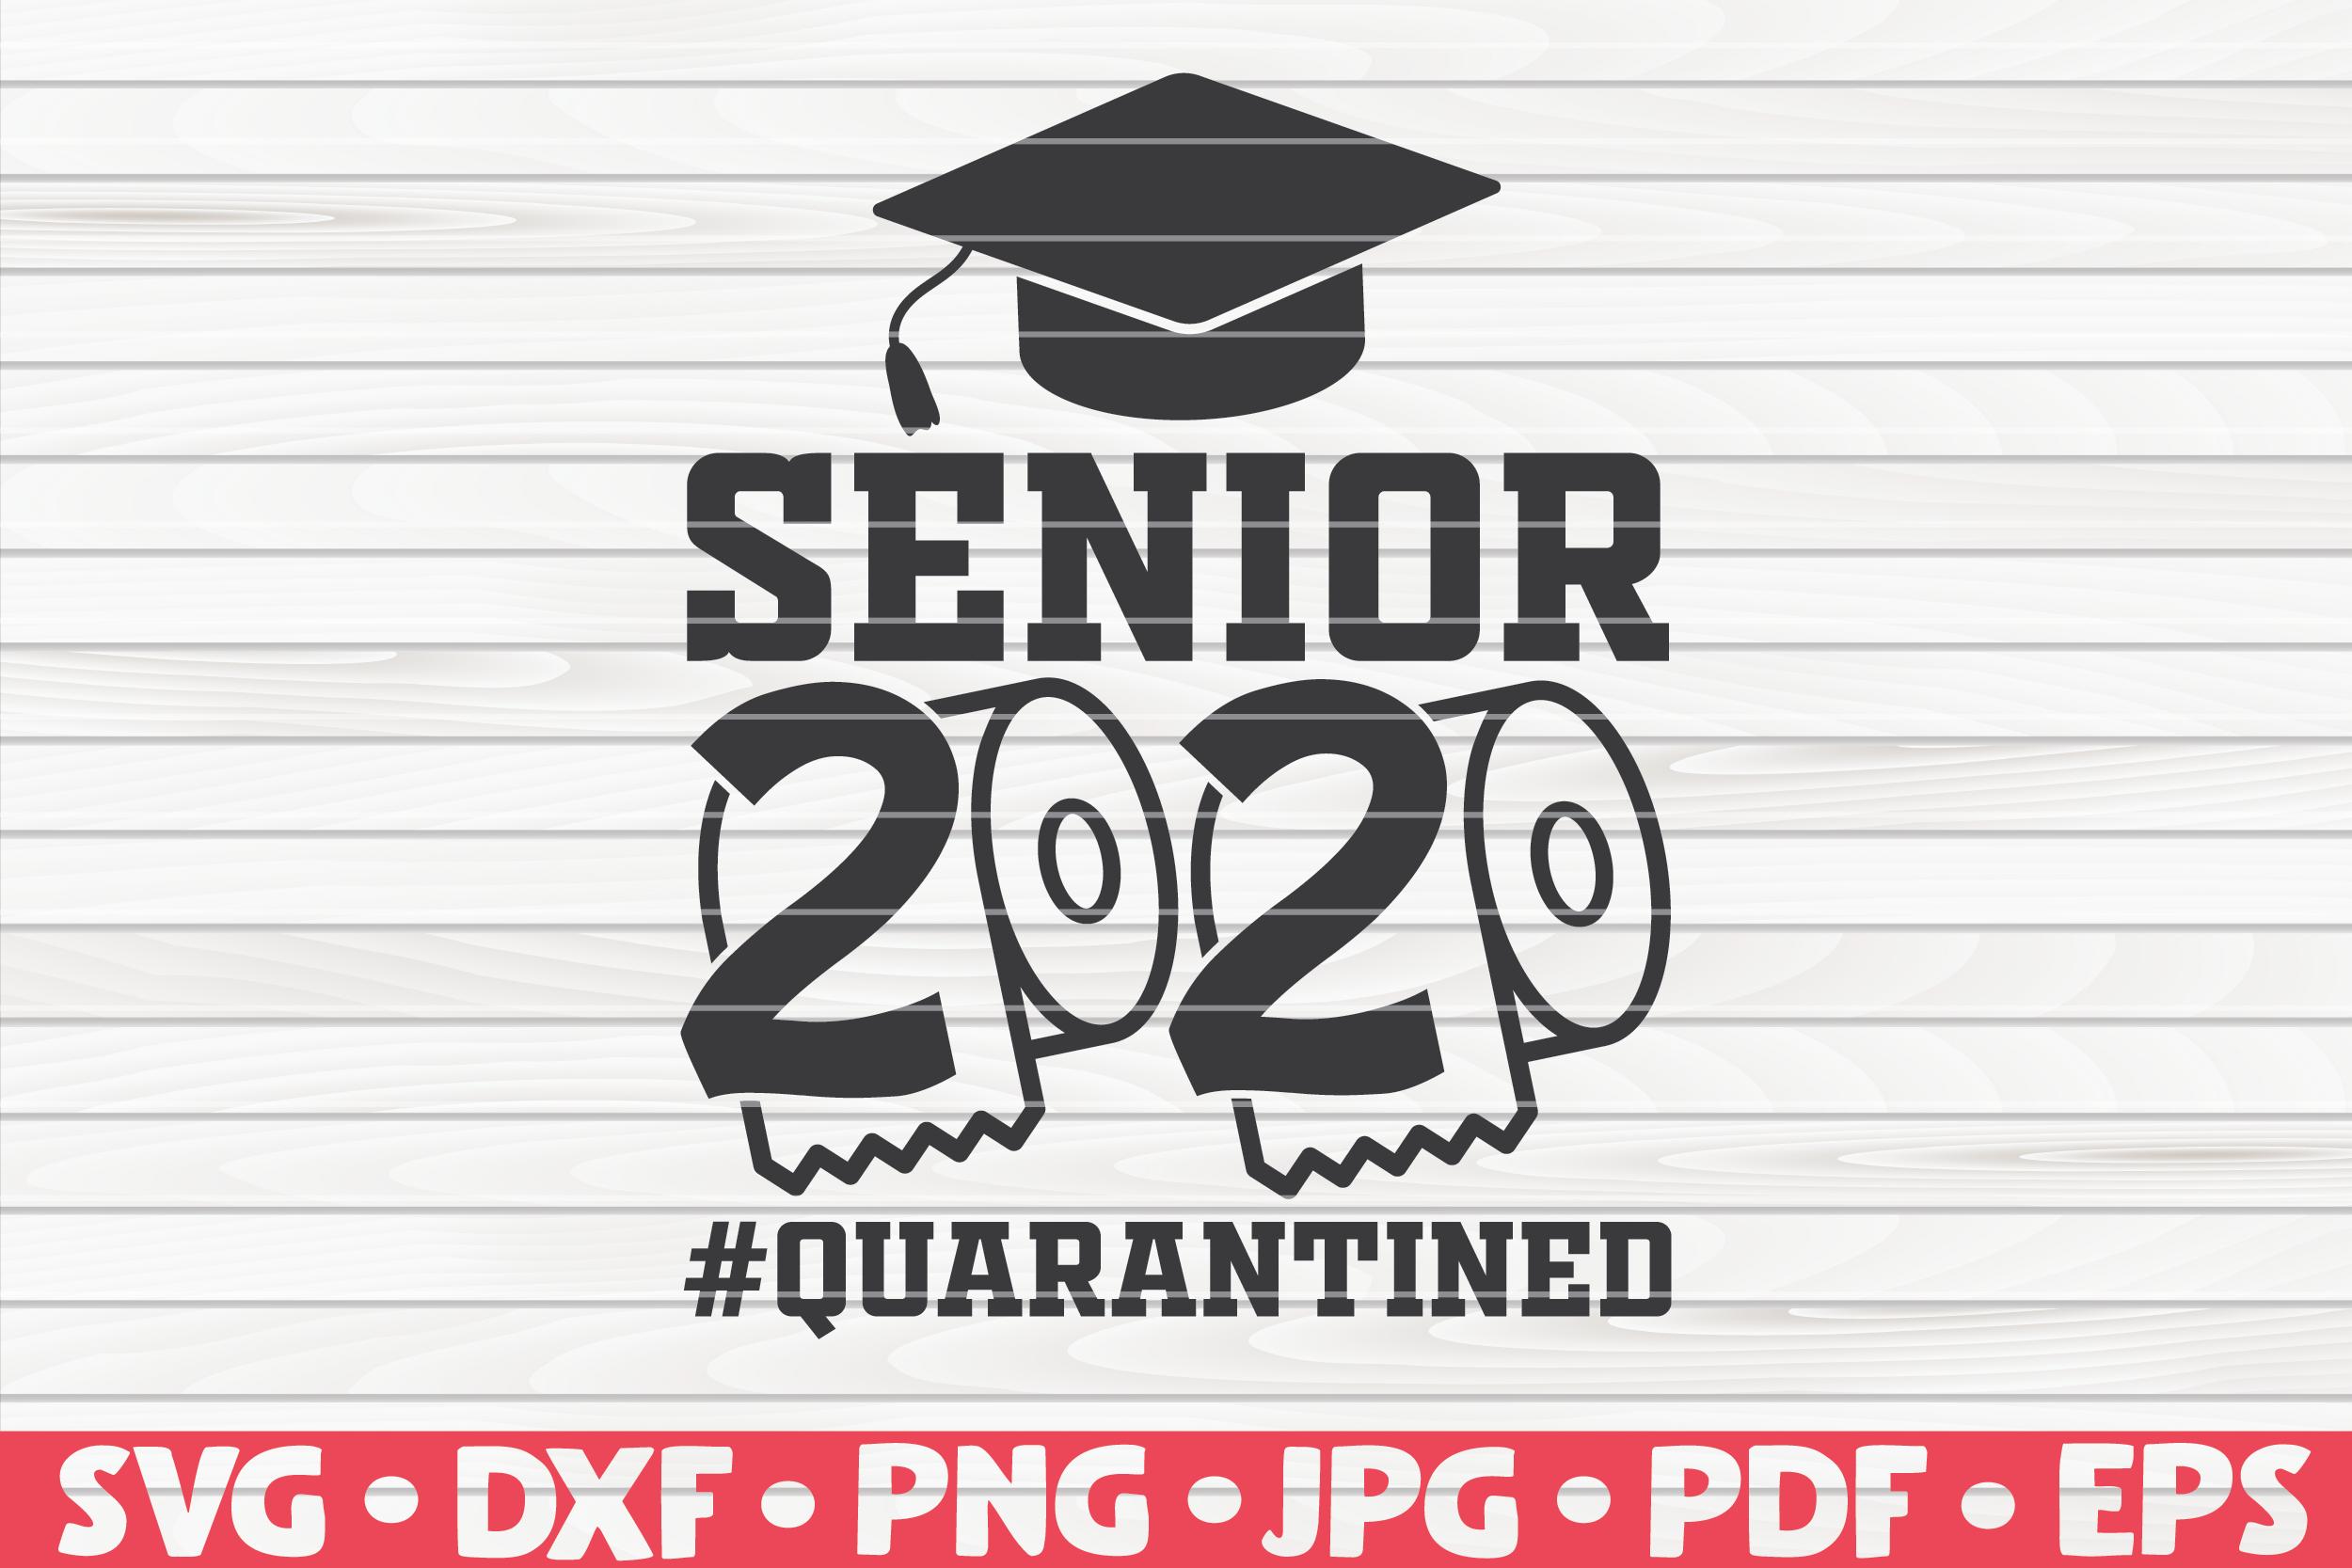 Senior 2020 Svg Quarantine Social Distancing By Hqdigitalart